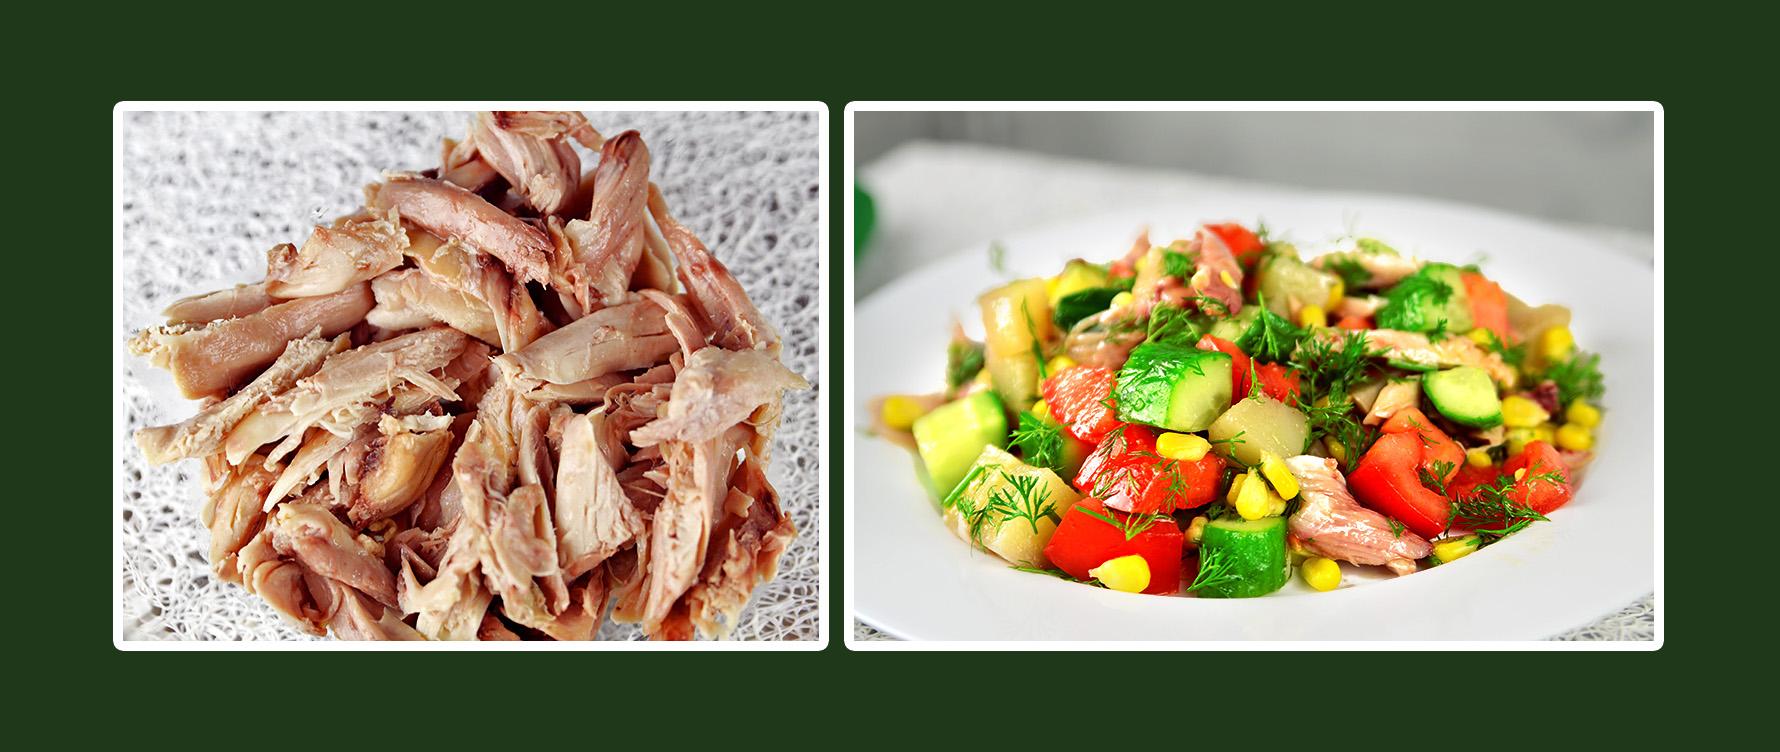 Gemüsesalat mit Hähnchenbrustfilet das Rezept